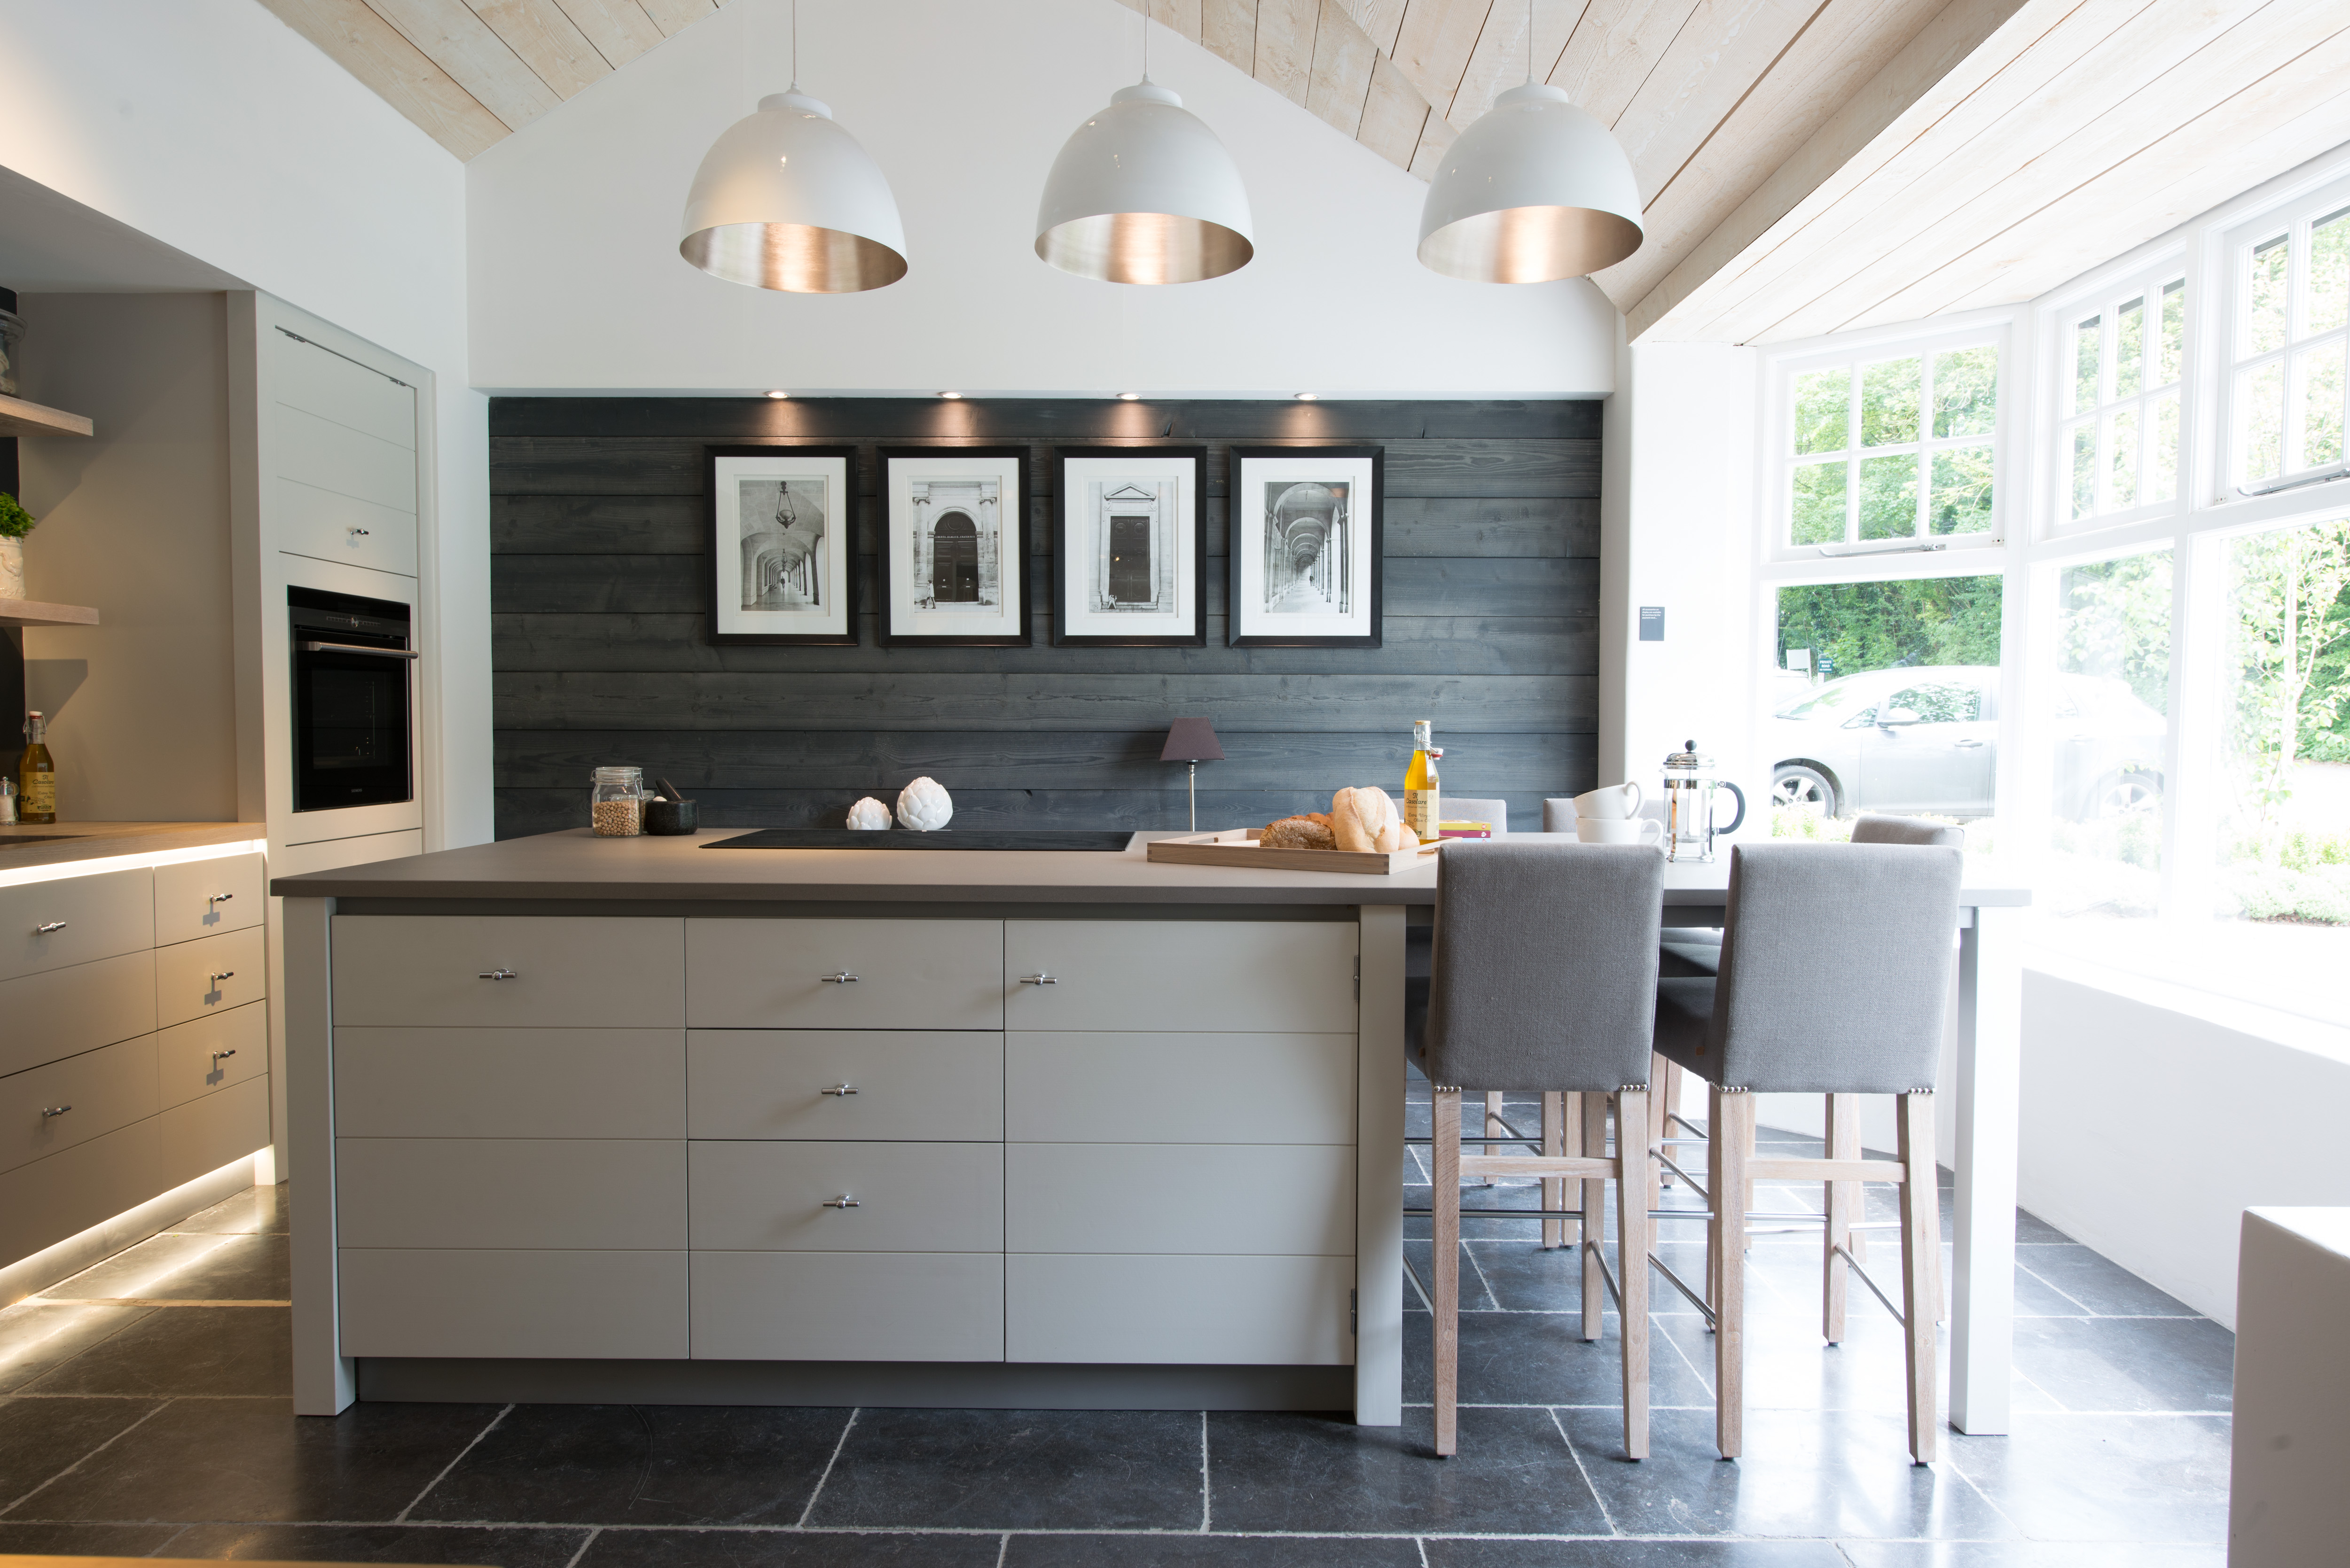 Kitchen Tiles Limerick neptune buxton limestone flooring tile 60x40cm - river grey